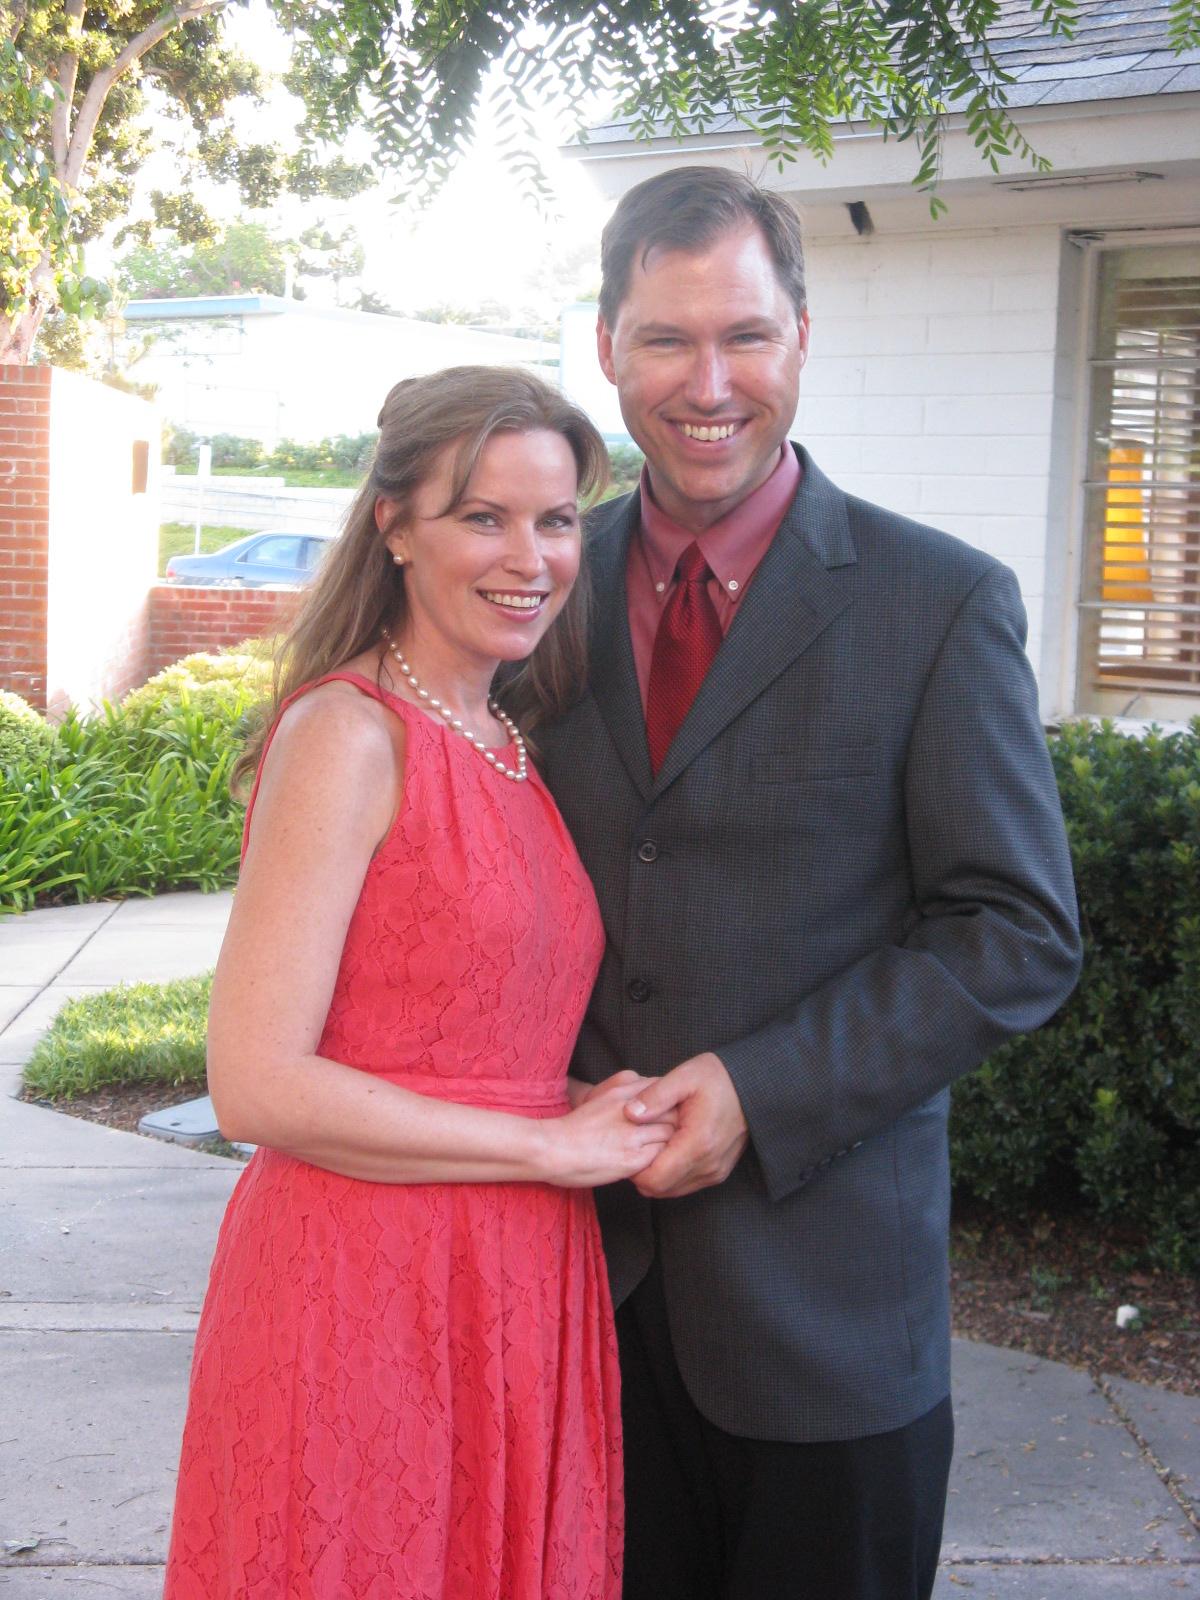 Megan Weston & Chad Frisque